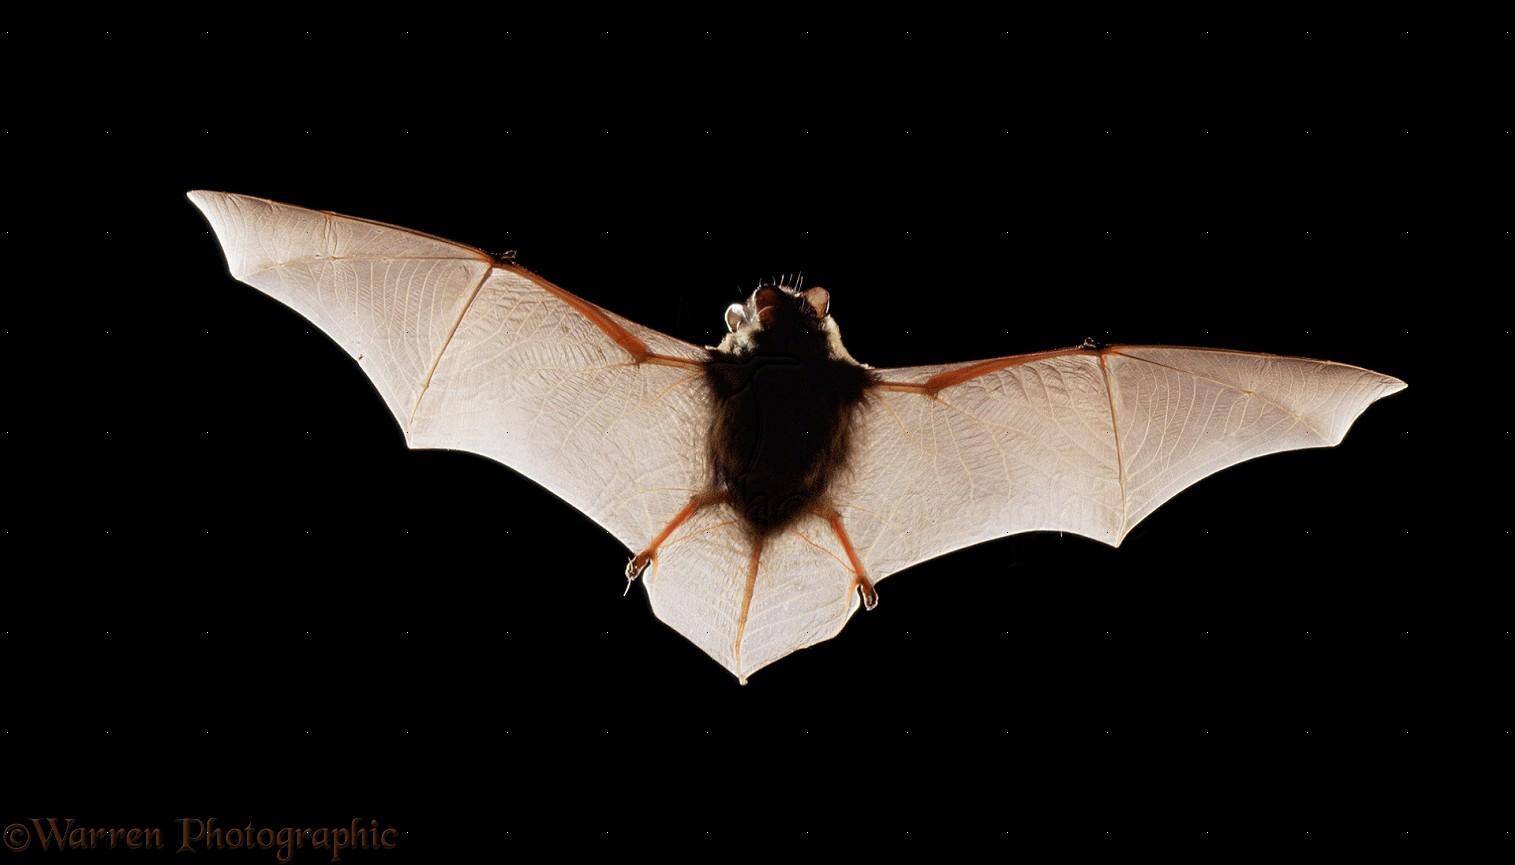 pipistrelle bat photo wp11455